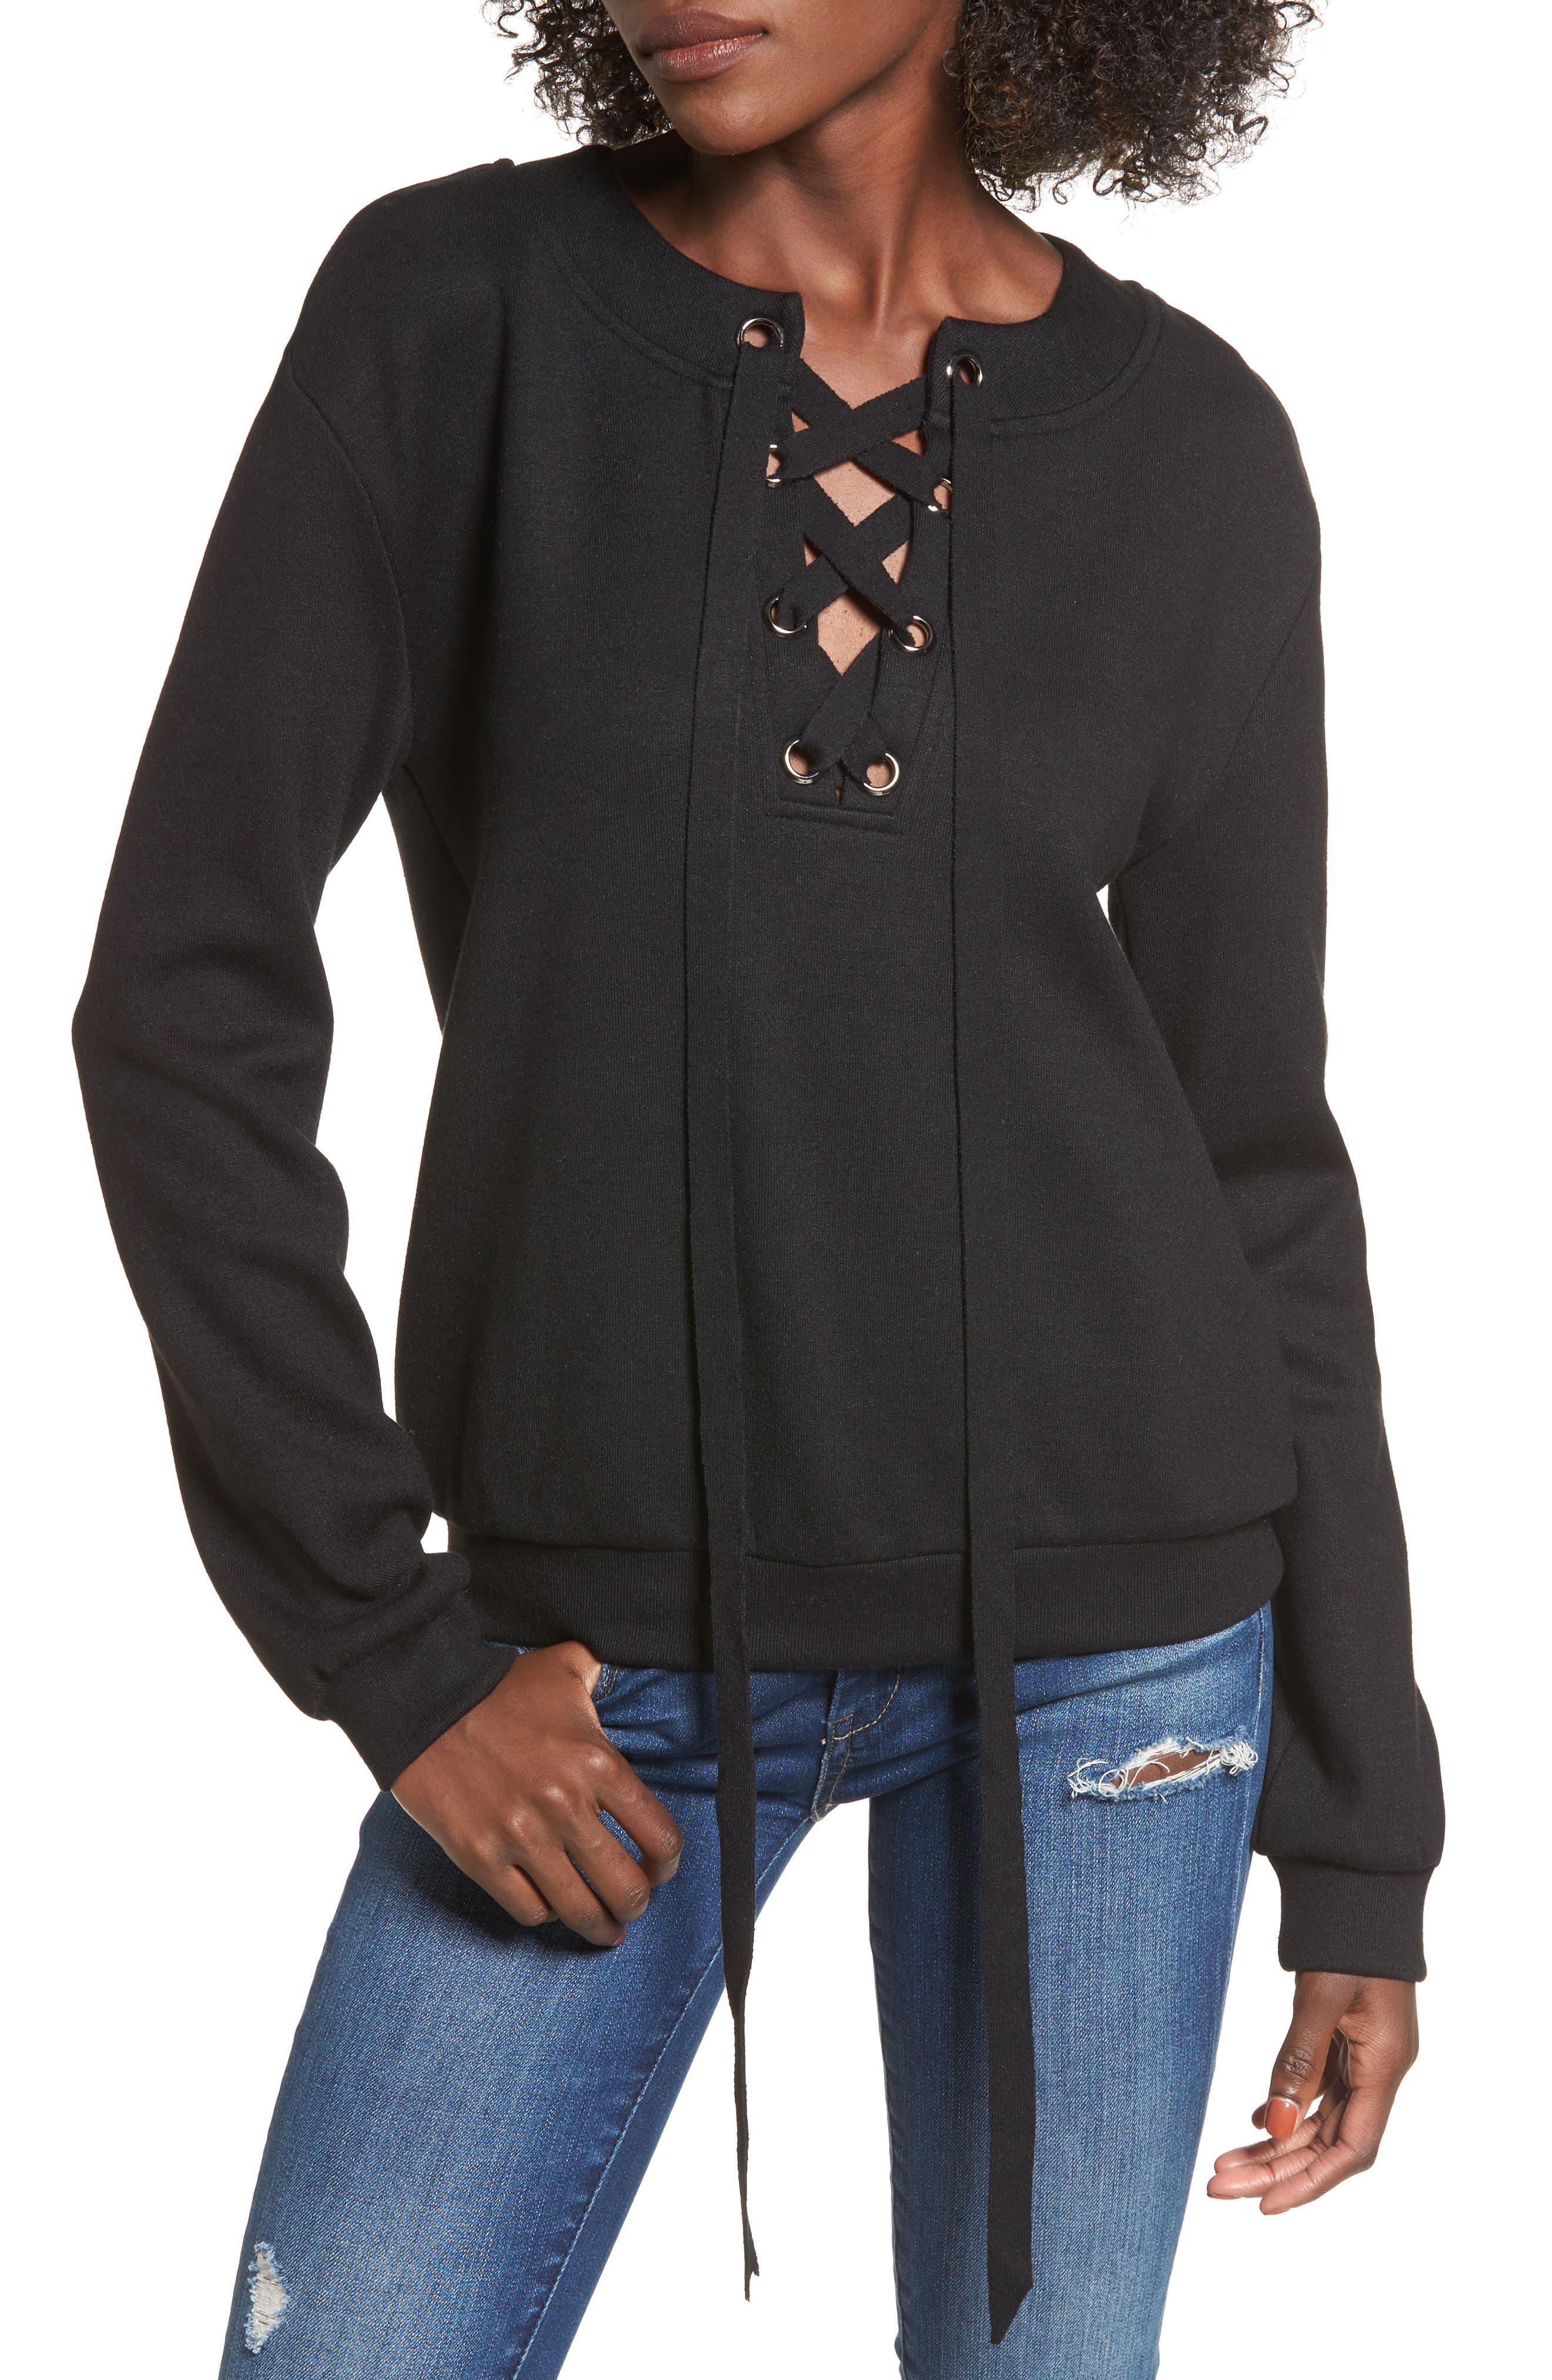 Alternate Image 1 Selected - J.O.A. Lace-Up Sweatshirt